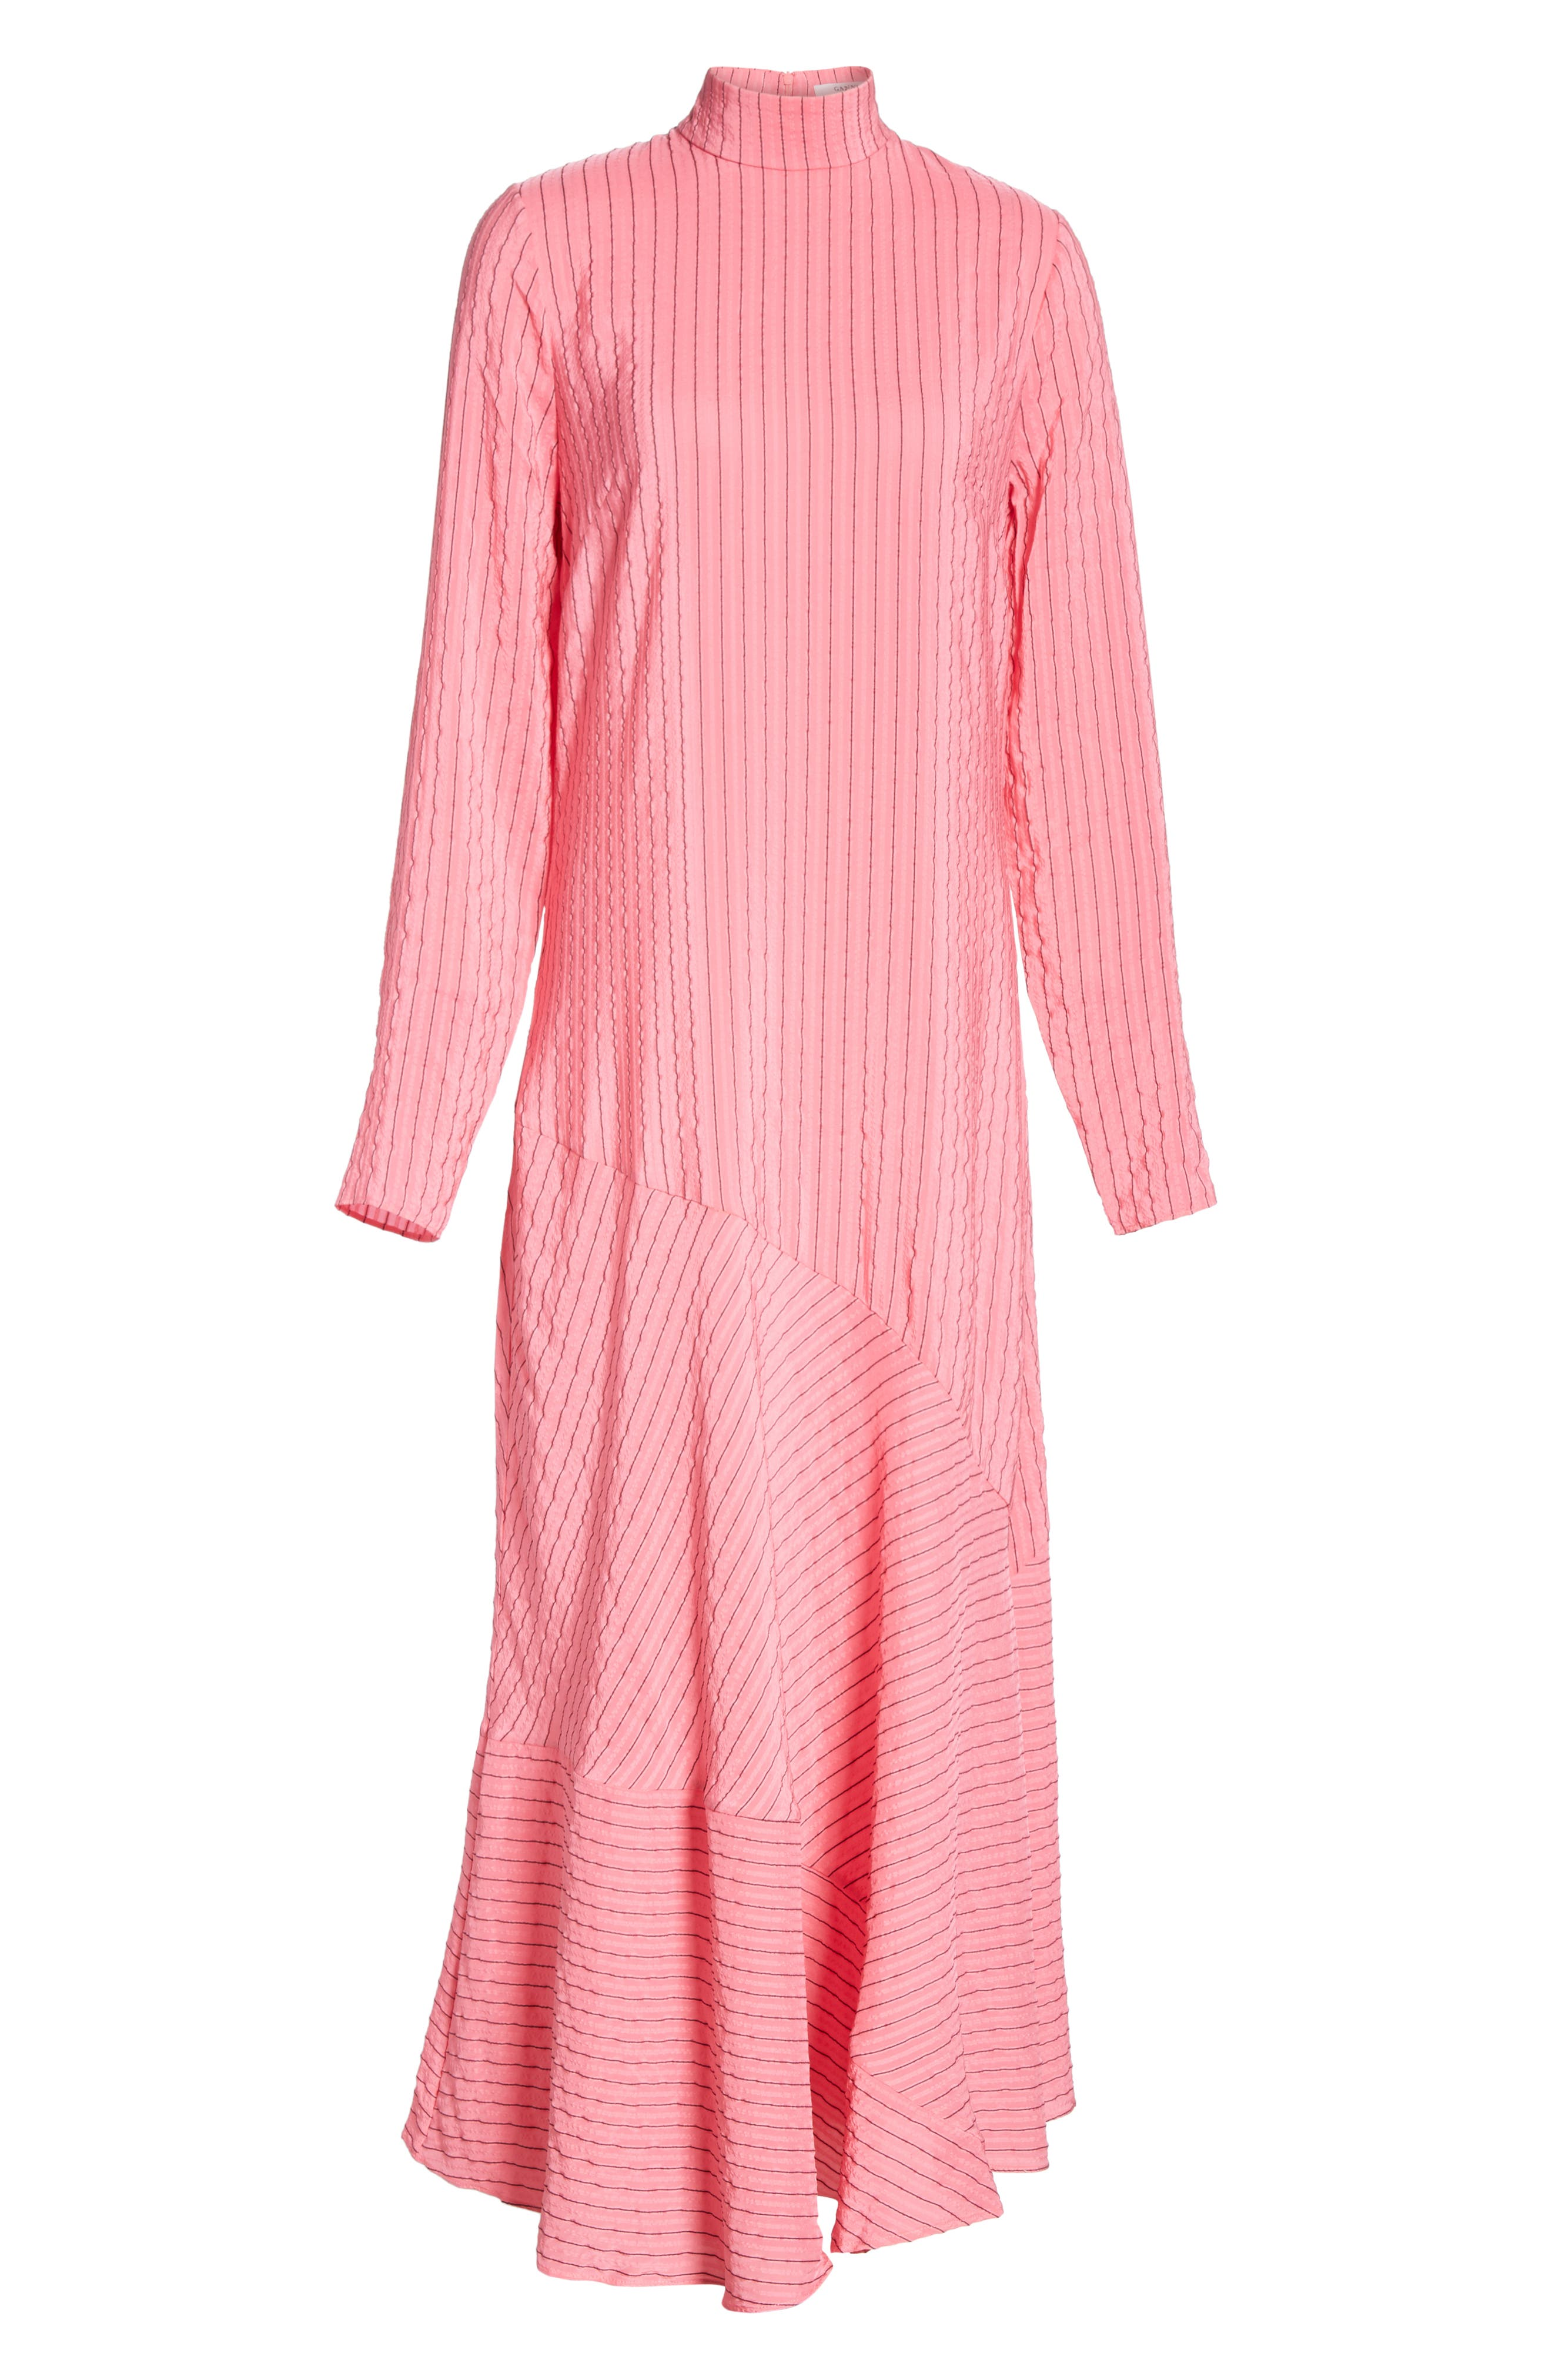 Seersucker Silk Blend Dress,                             Alternate thumbnail 6, color,                             650